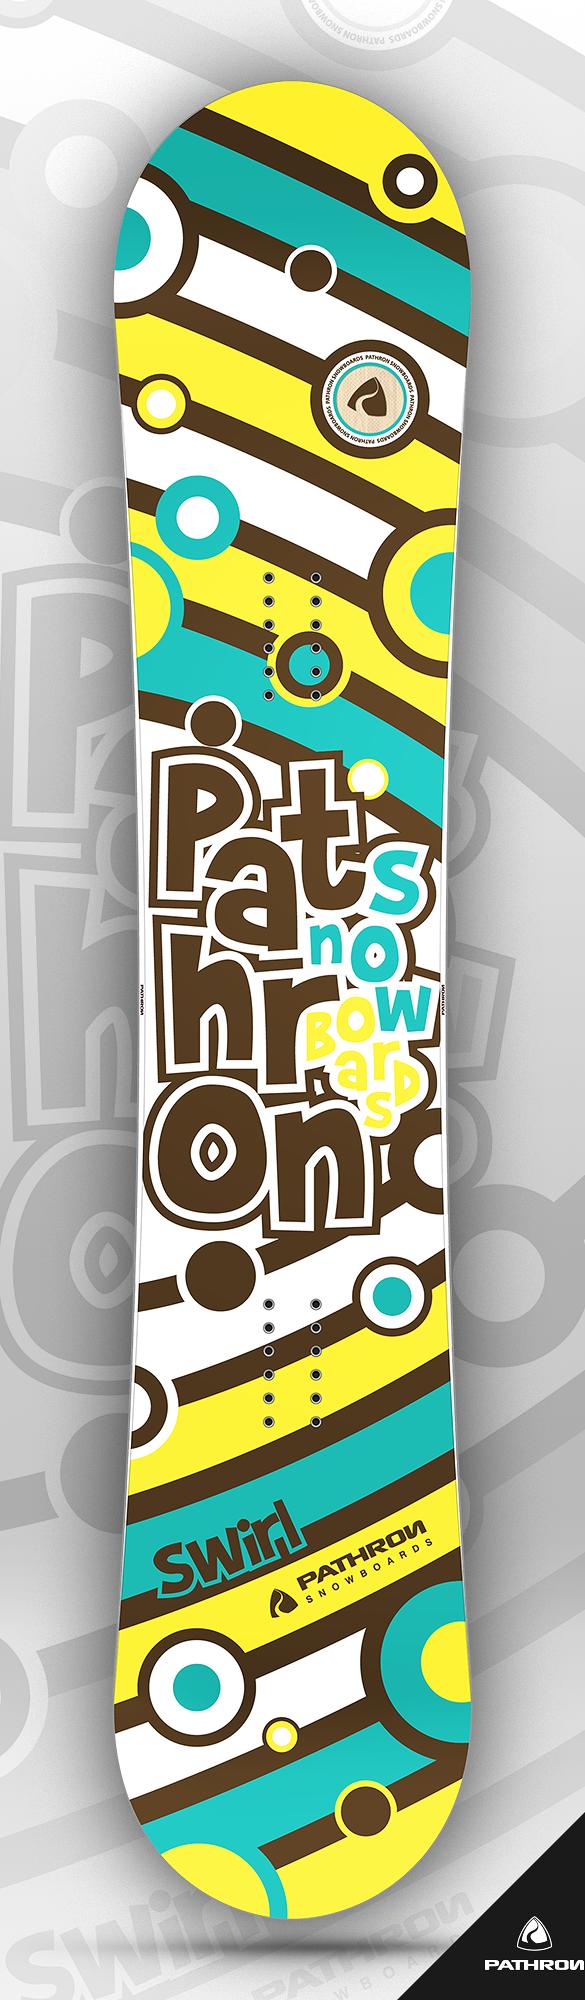 pathron-swirl5